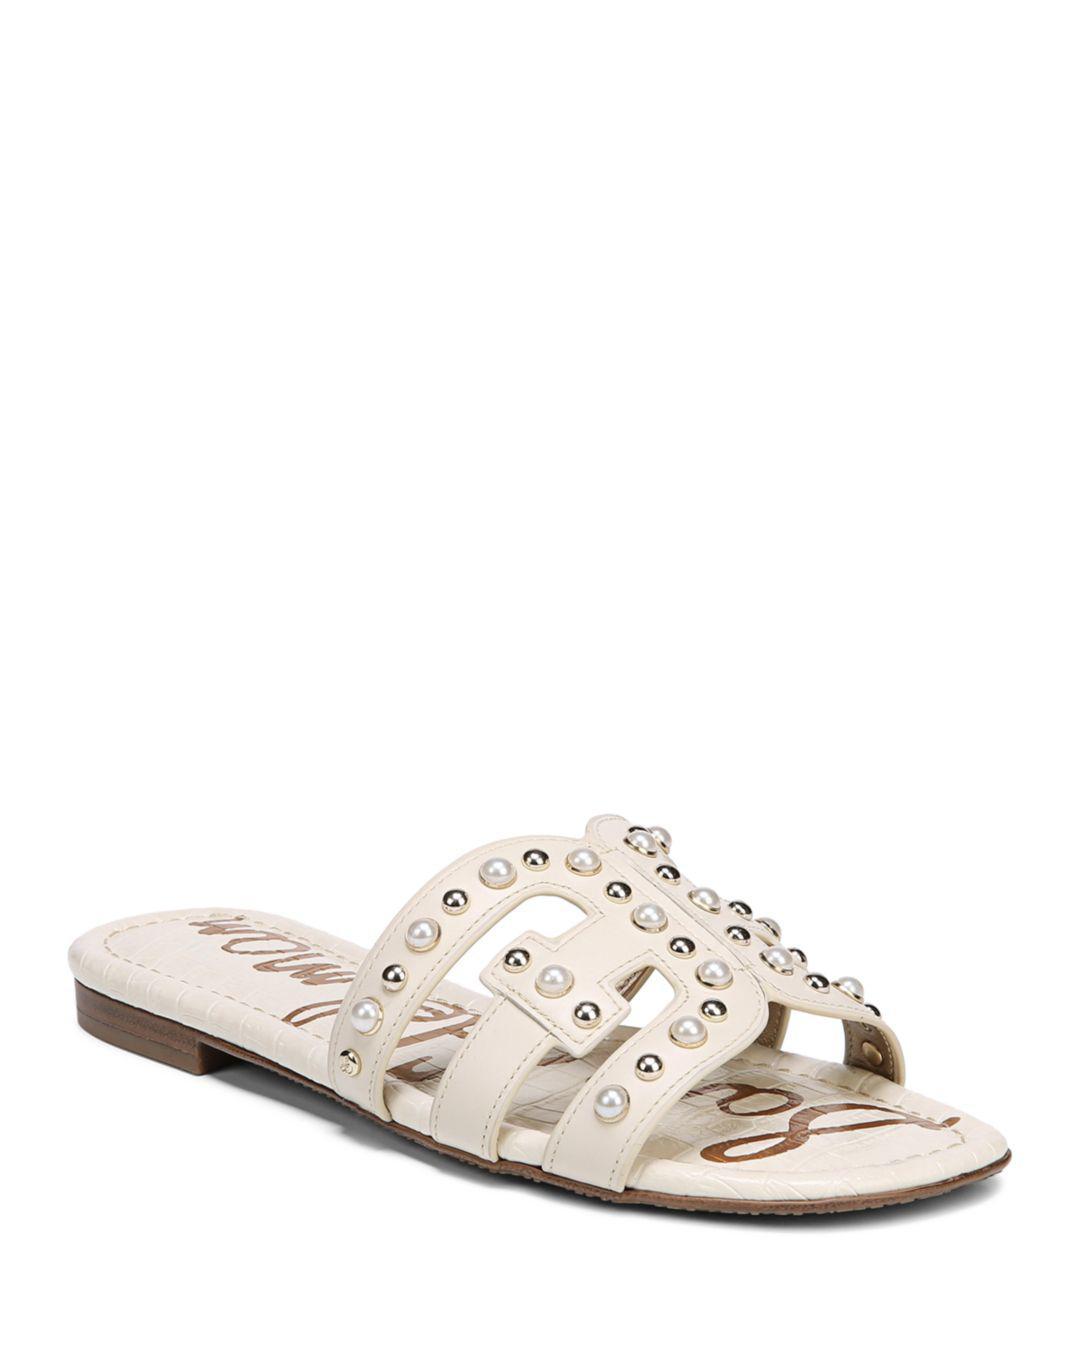 d57289069 Sam Edelman Women s Bay 2 Leather Embellished Slide Sandals in White ...